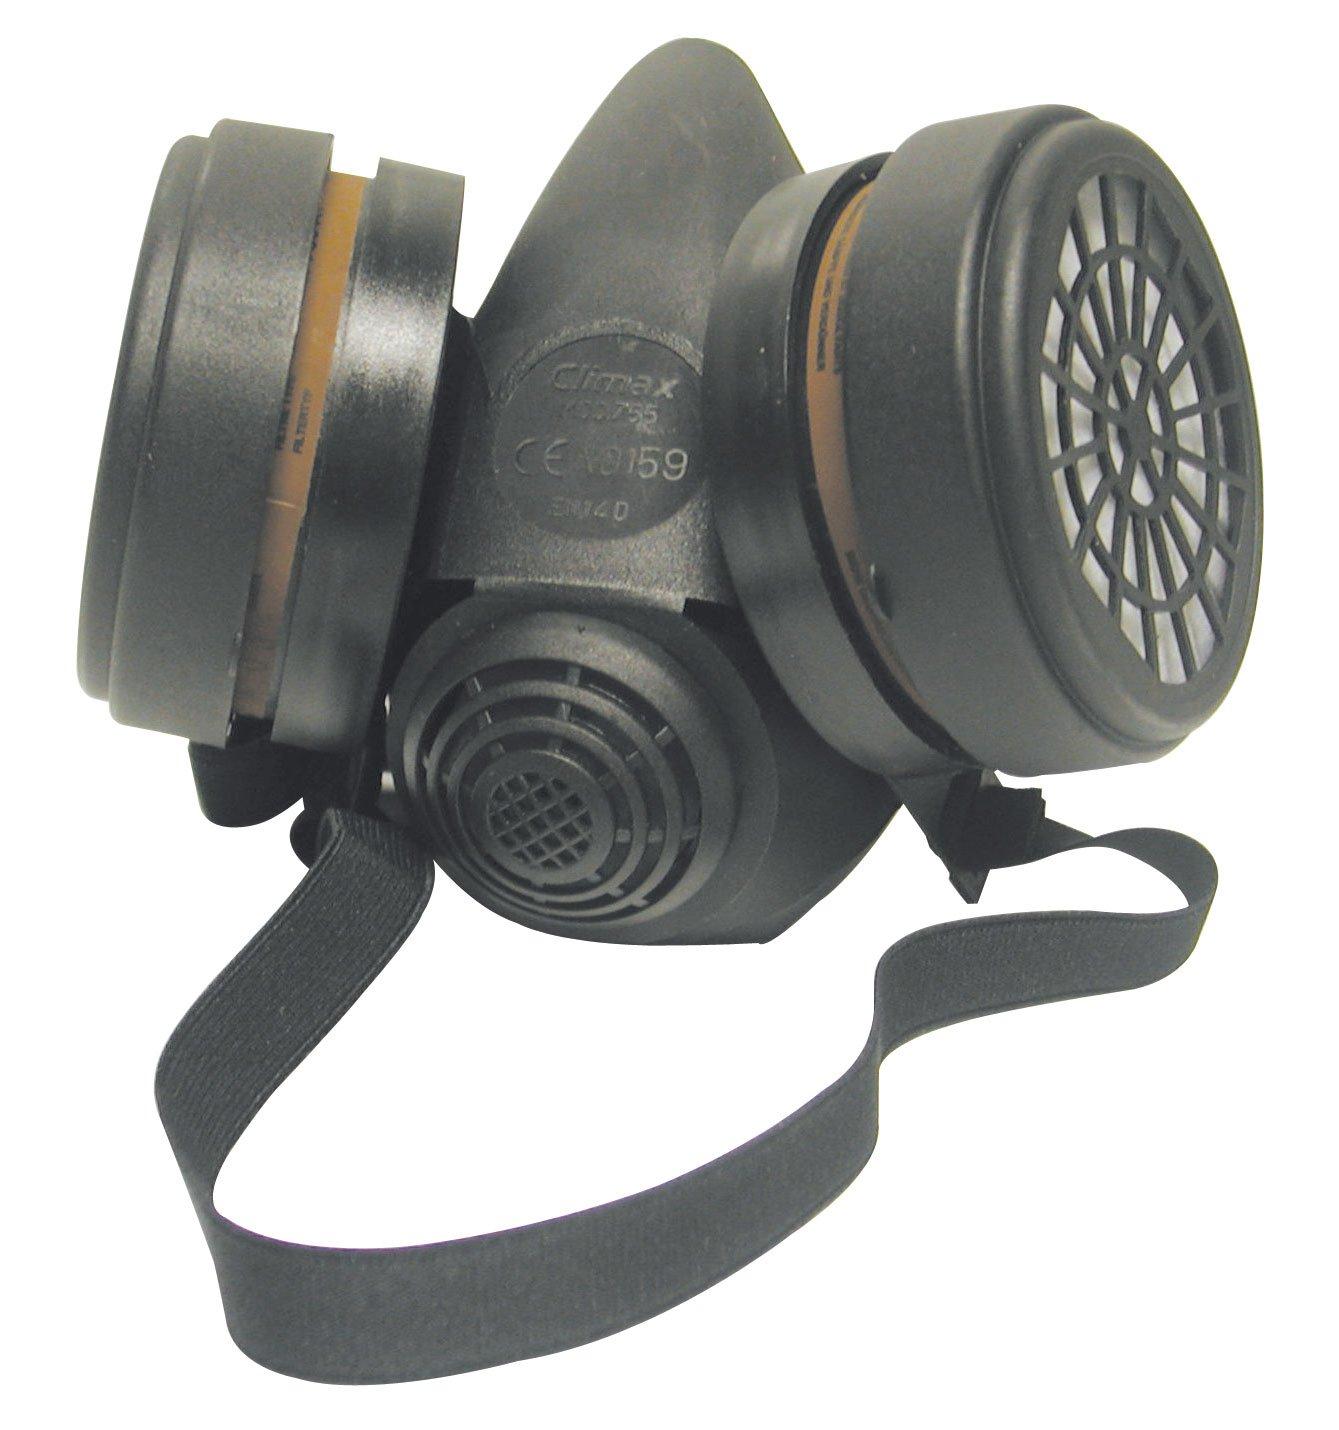 Mecafer 154283 M3 Masque protection avec 2 x A1 filtres.